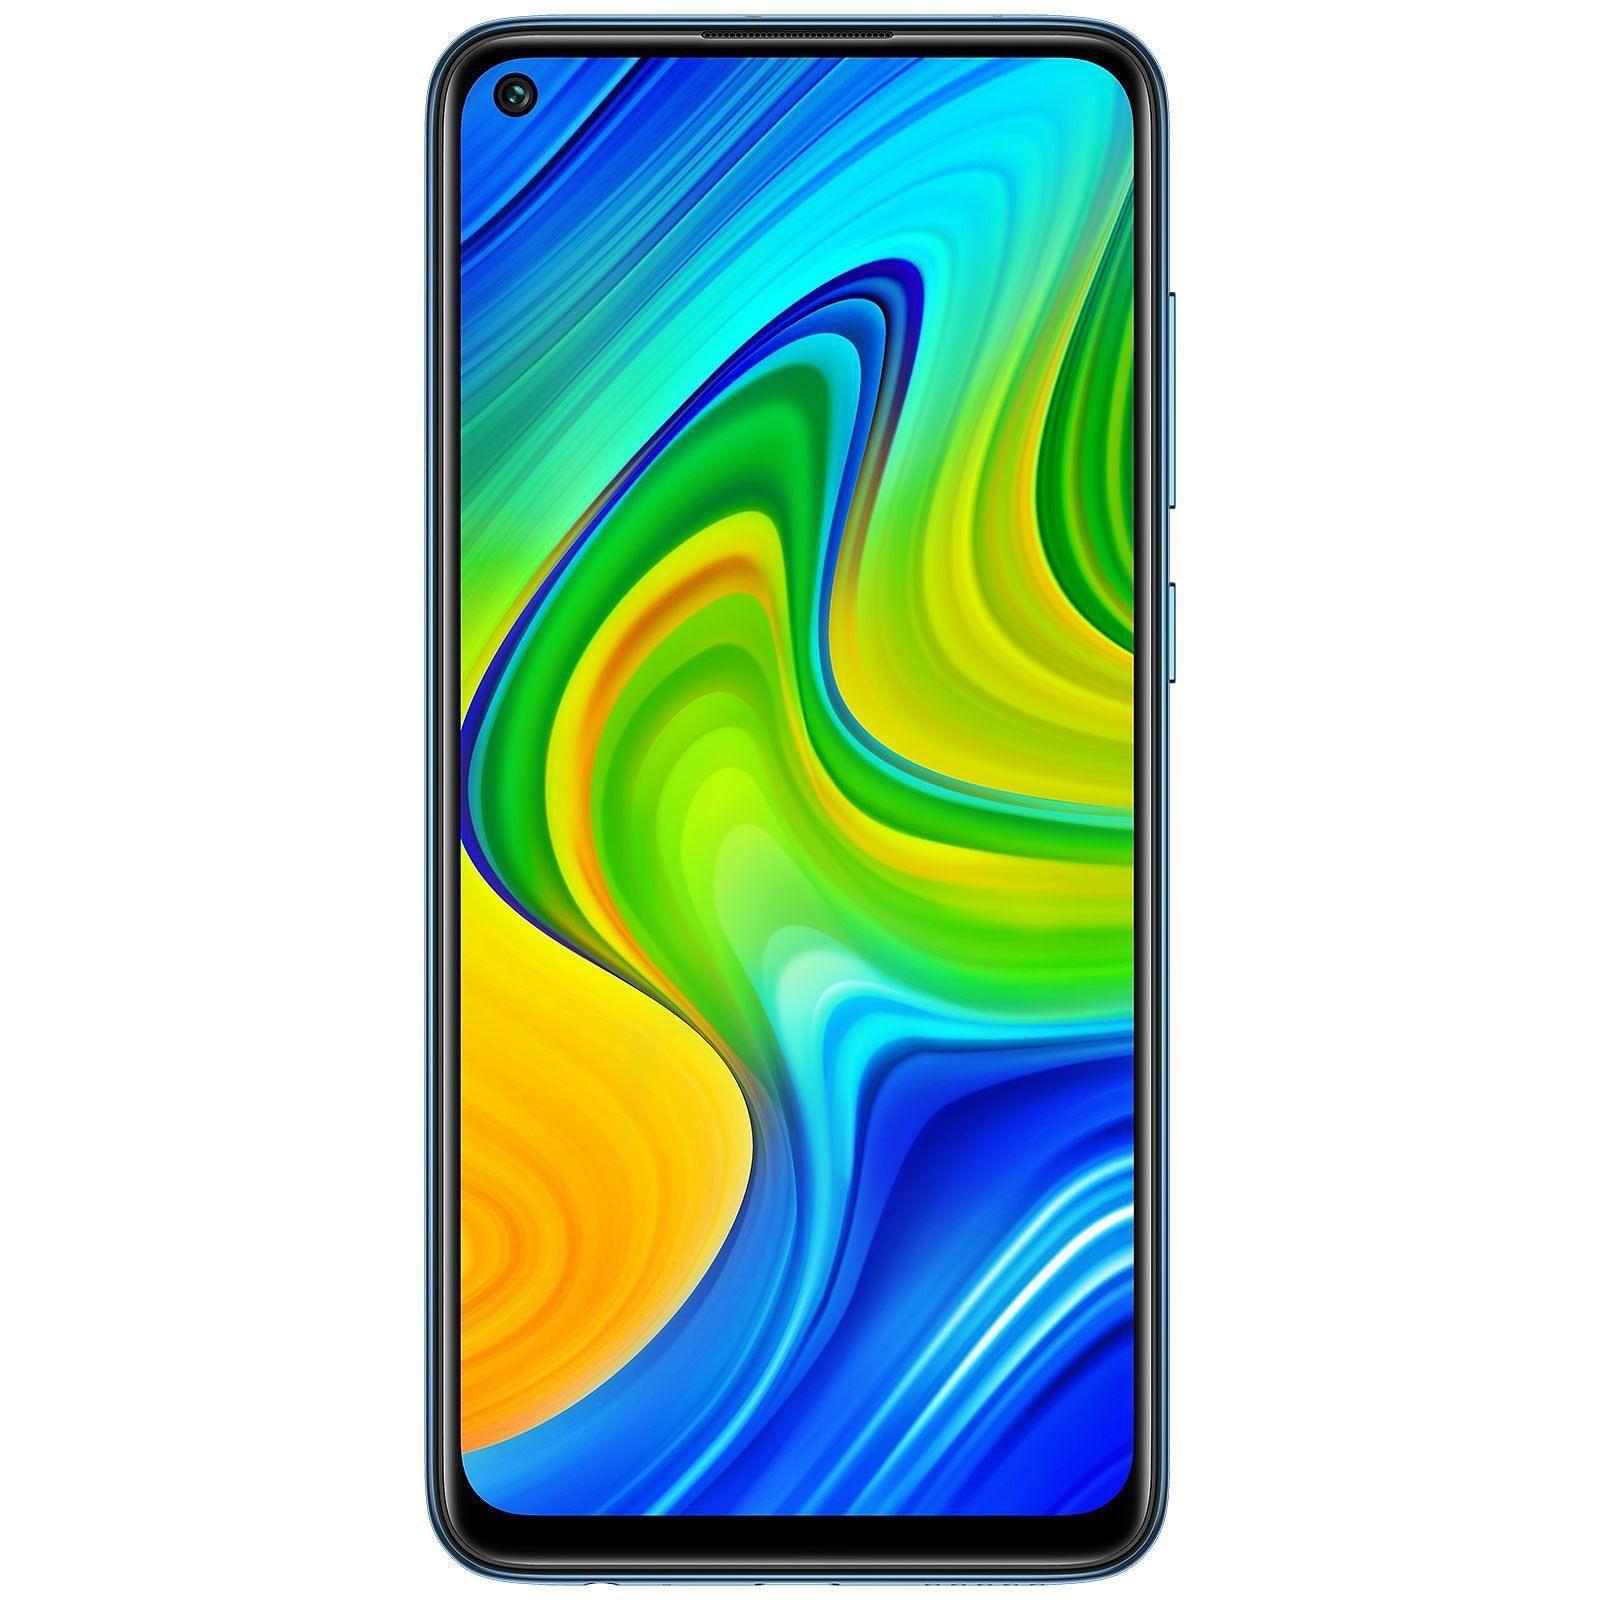 "Xiaomi Redmi Note 9 64/3GB (Helio G85, 6.53"" FHD Display, NFC: Google Pay, 5020mAh Akku, 48MP Kamera, Triple Slot, Klinke, IR, 199 Gramm)"